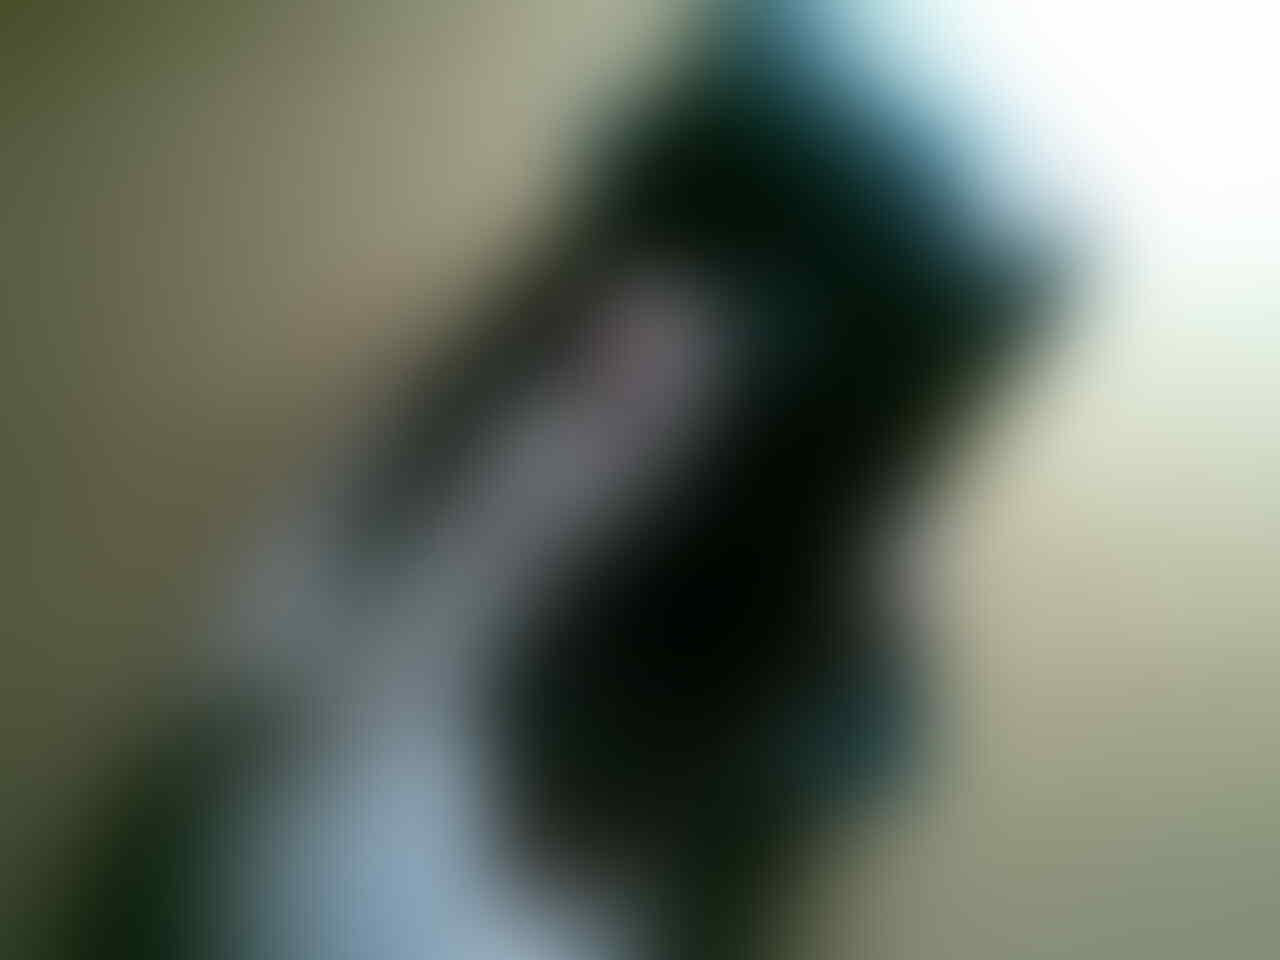 blackberry davis 9220 masih garansi TAM 2 tahun n(piano black)